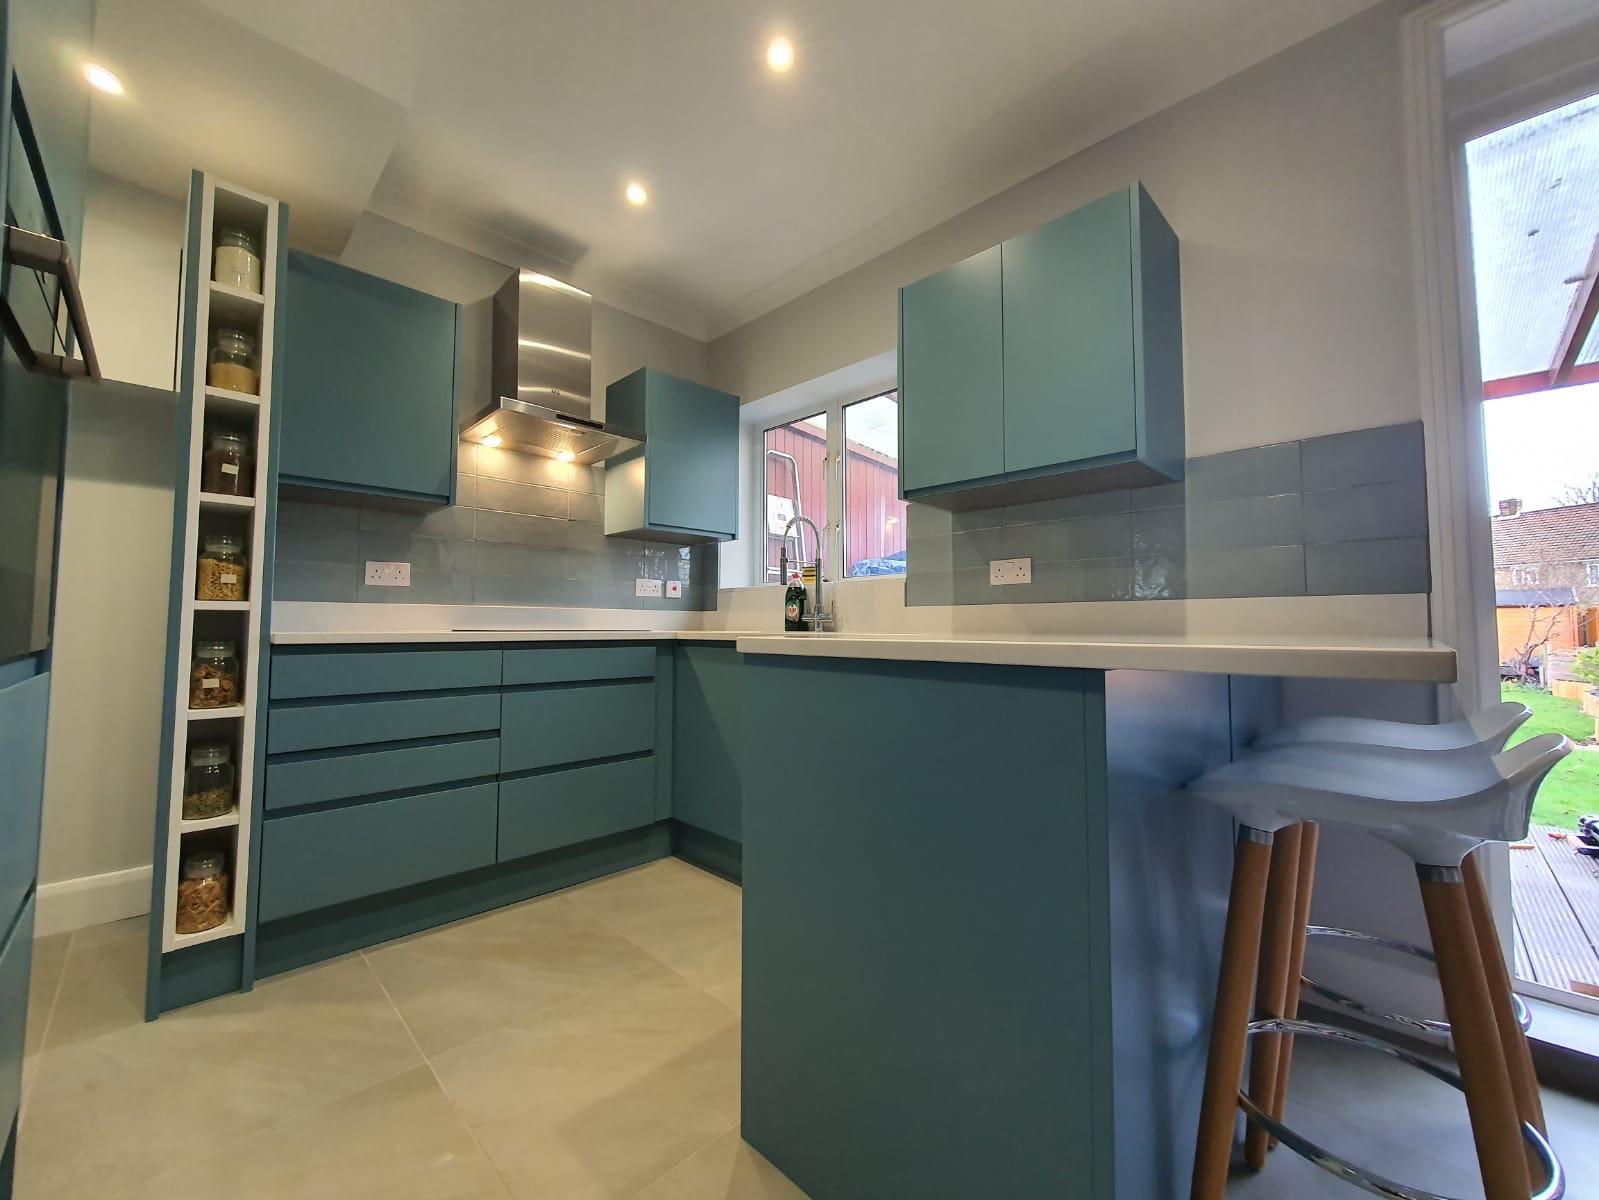 Kitchen Refurbishment in Catford SE6, South East London